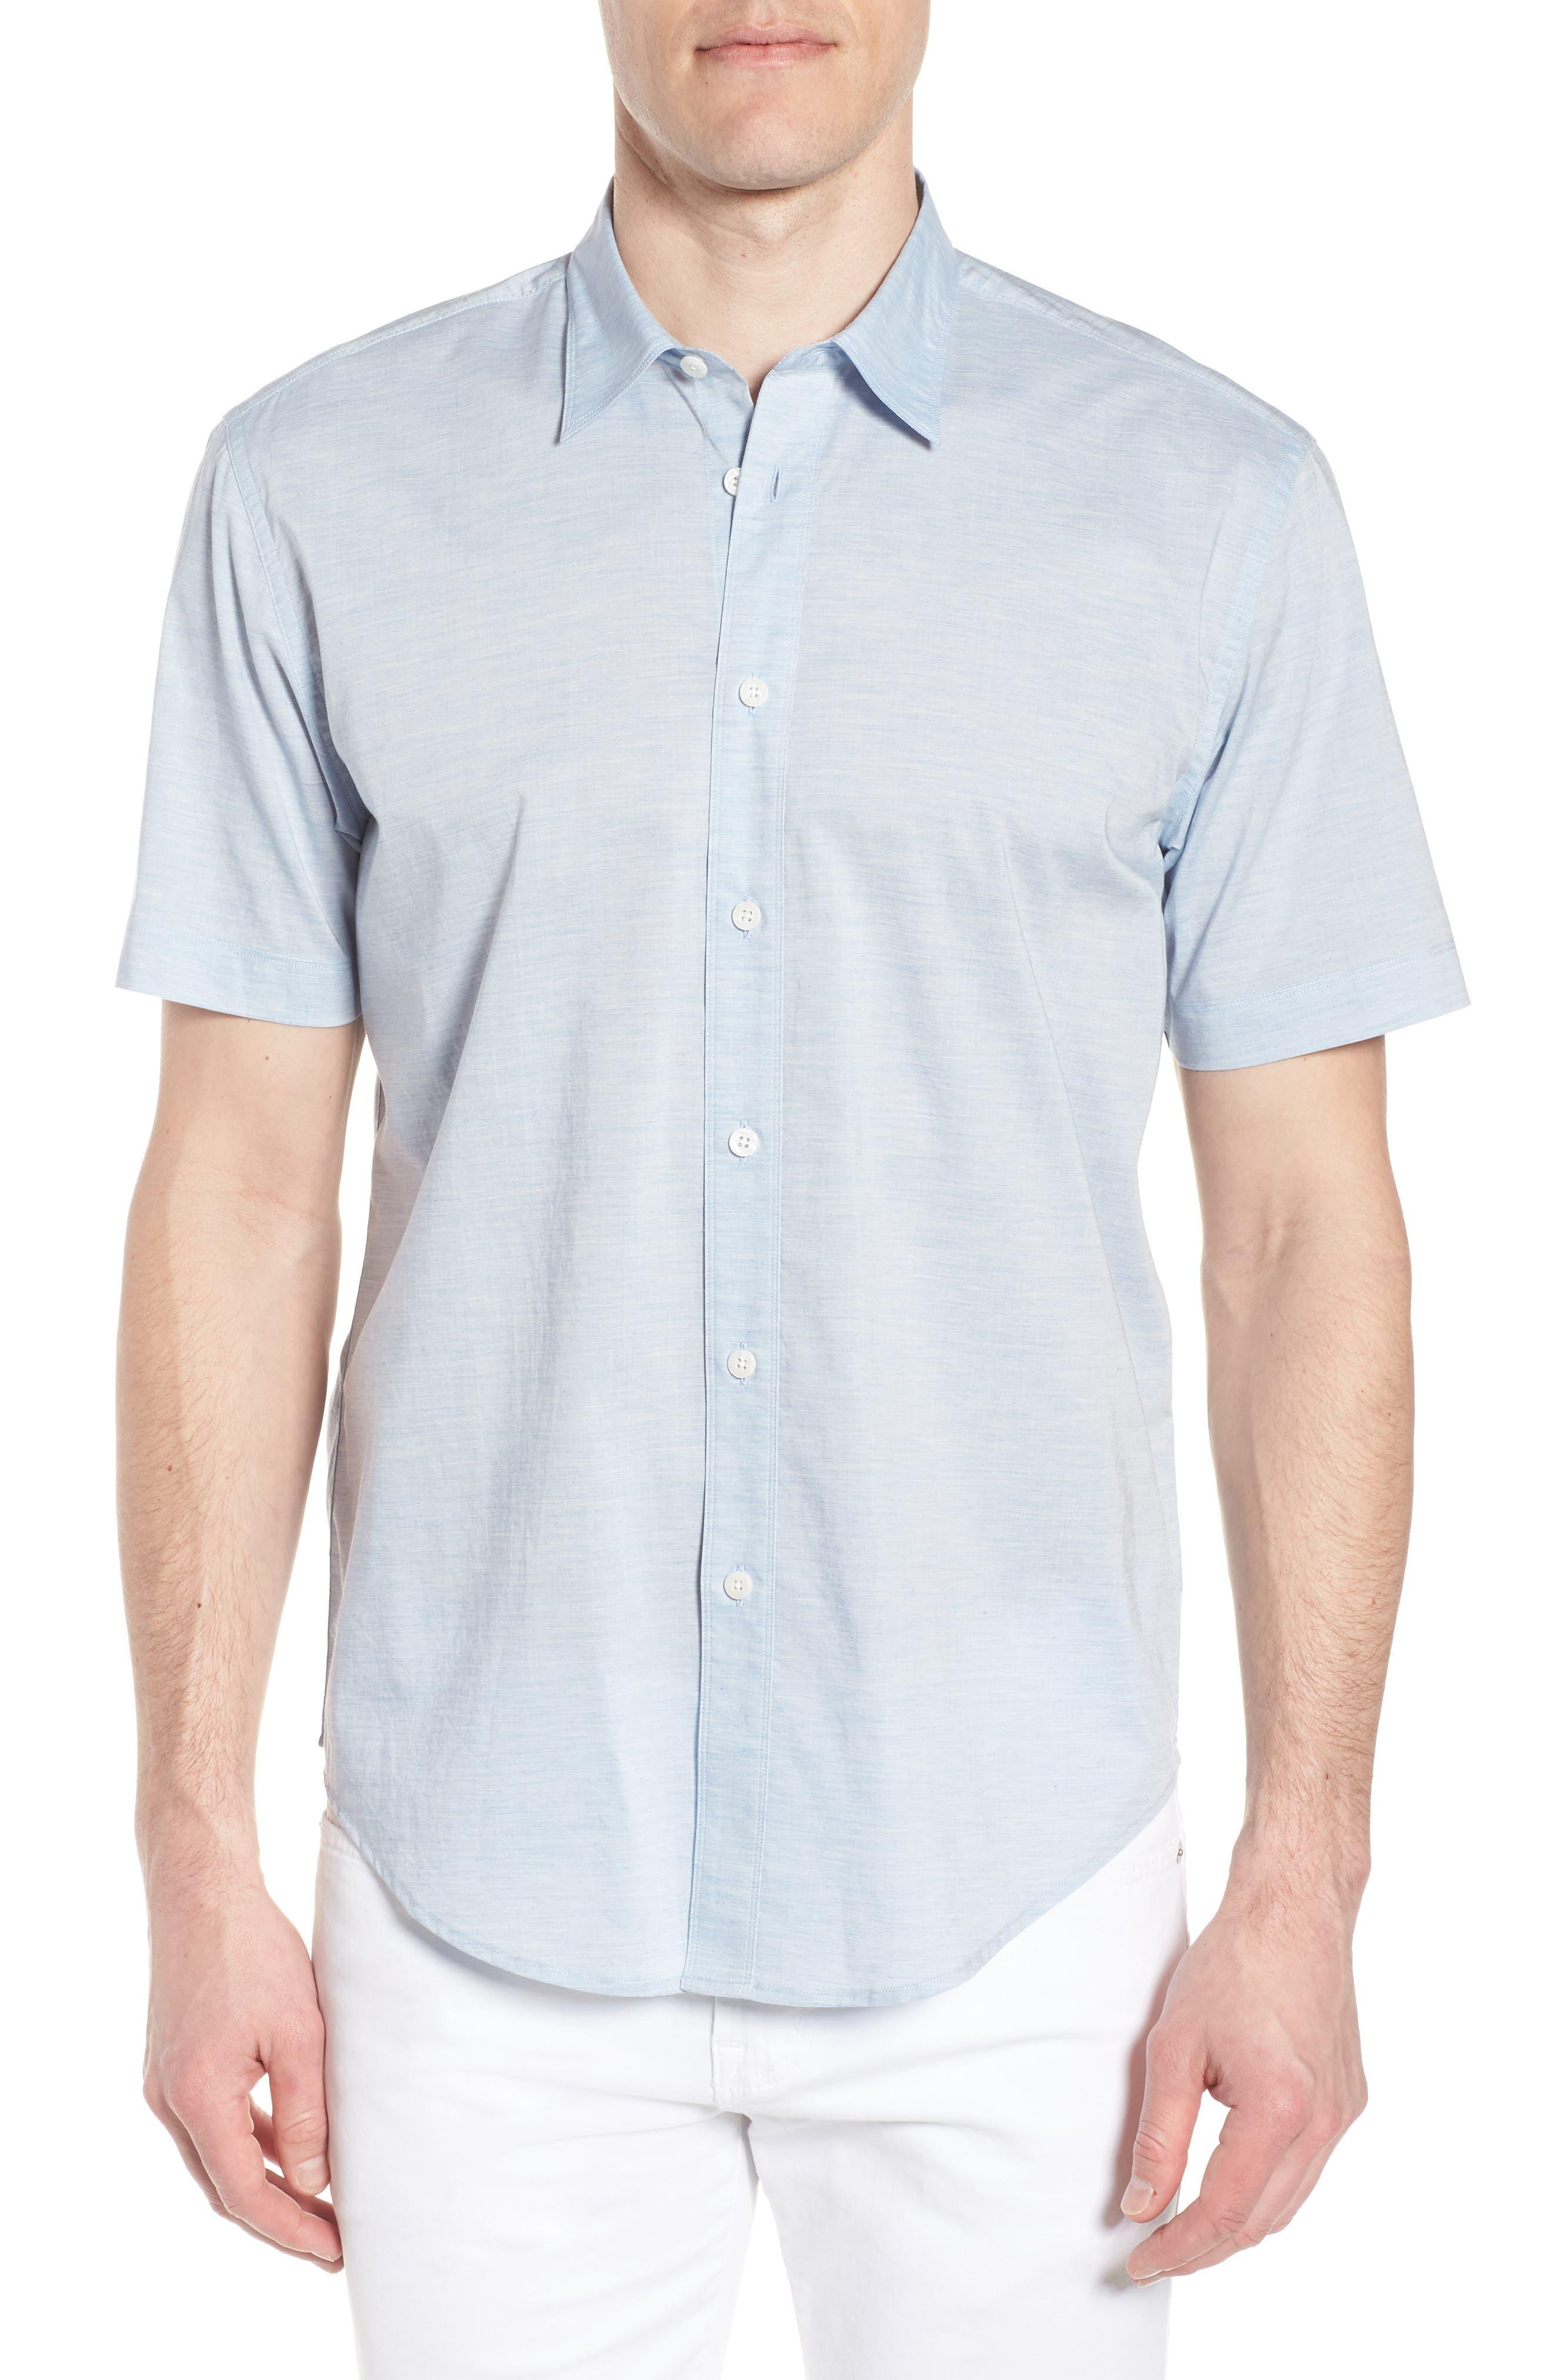 Solana Regular Fit Short Sleeve Sport Shirt,                             Main thumbnail 1, color,                             422